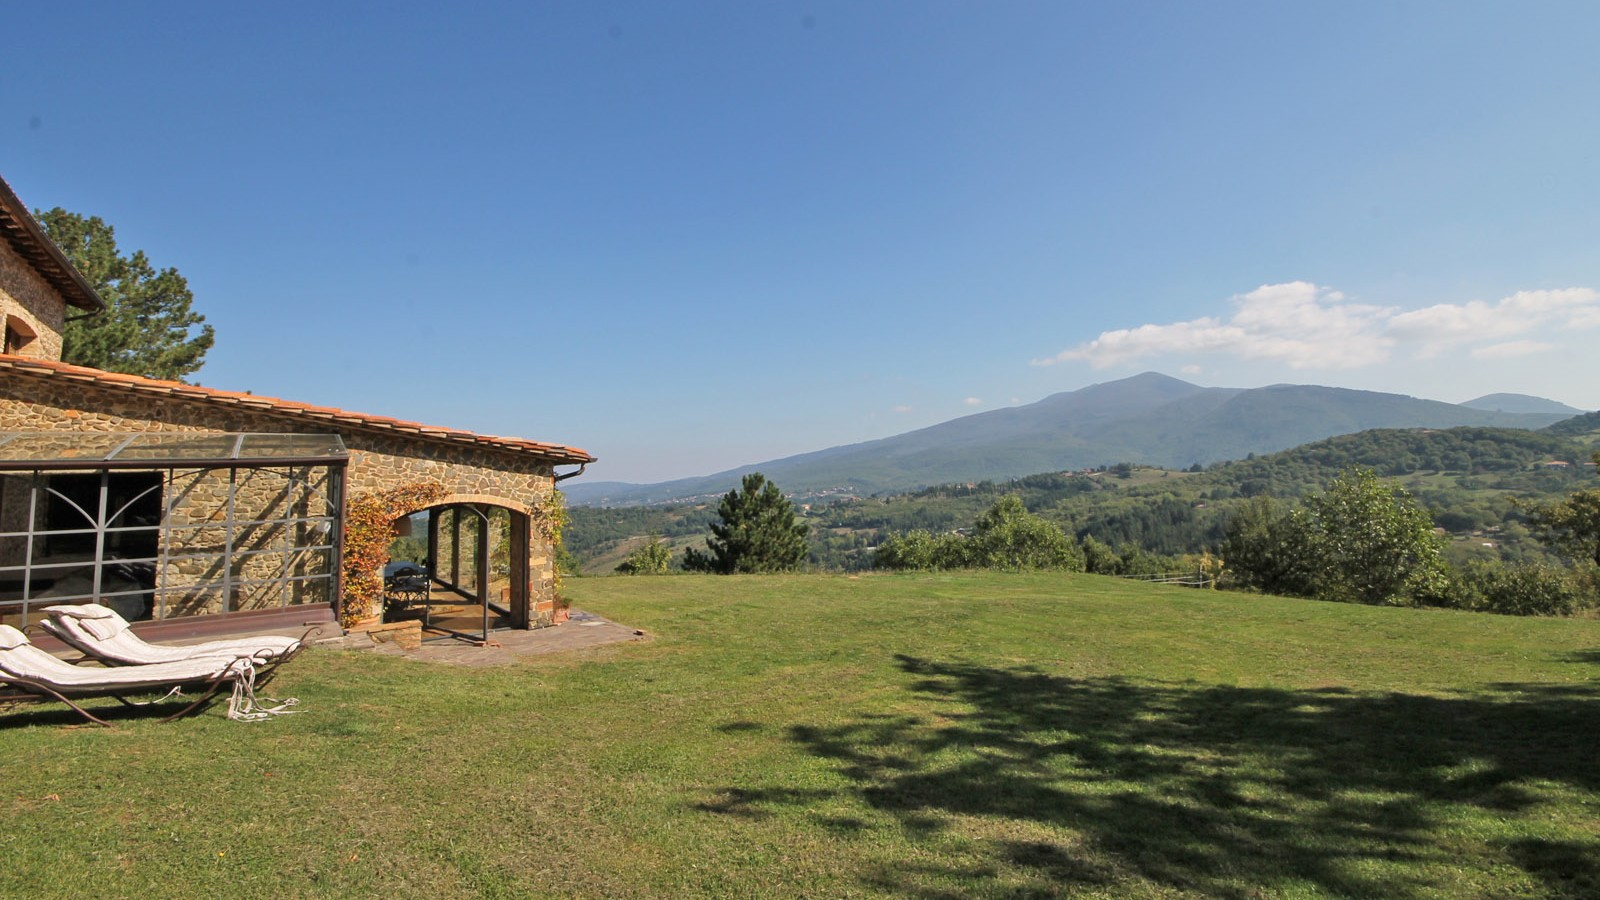 Ville e casali in toscana house and houses italia for Toscana house